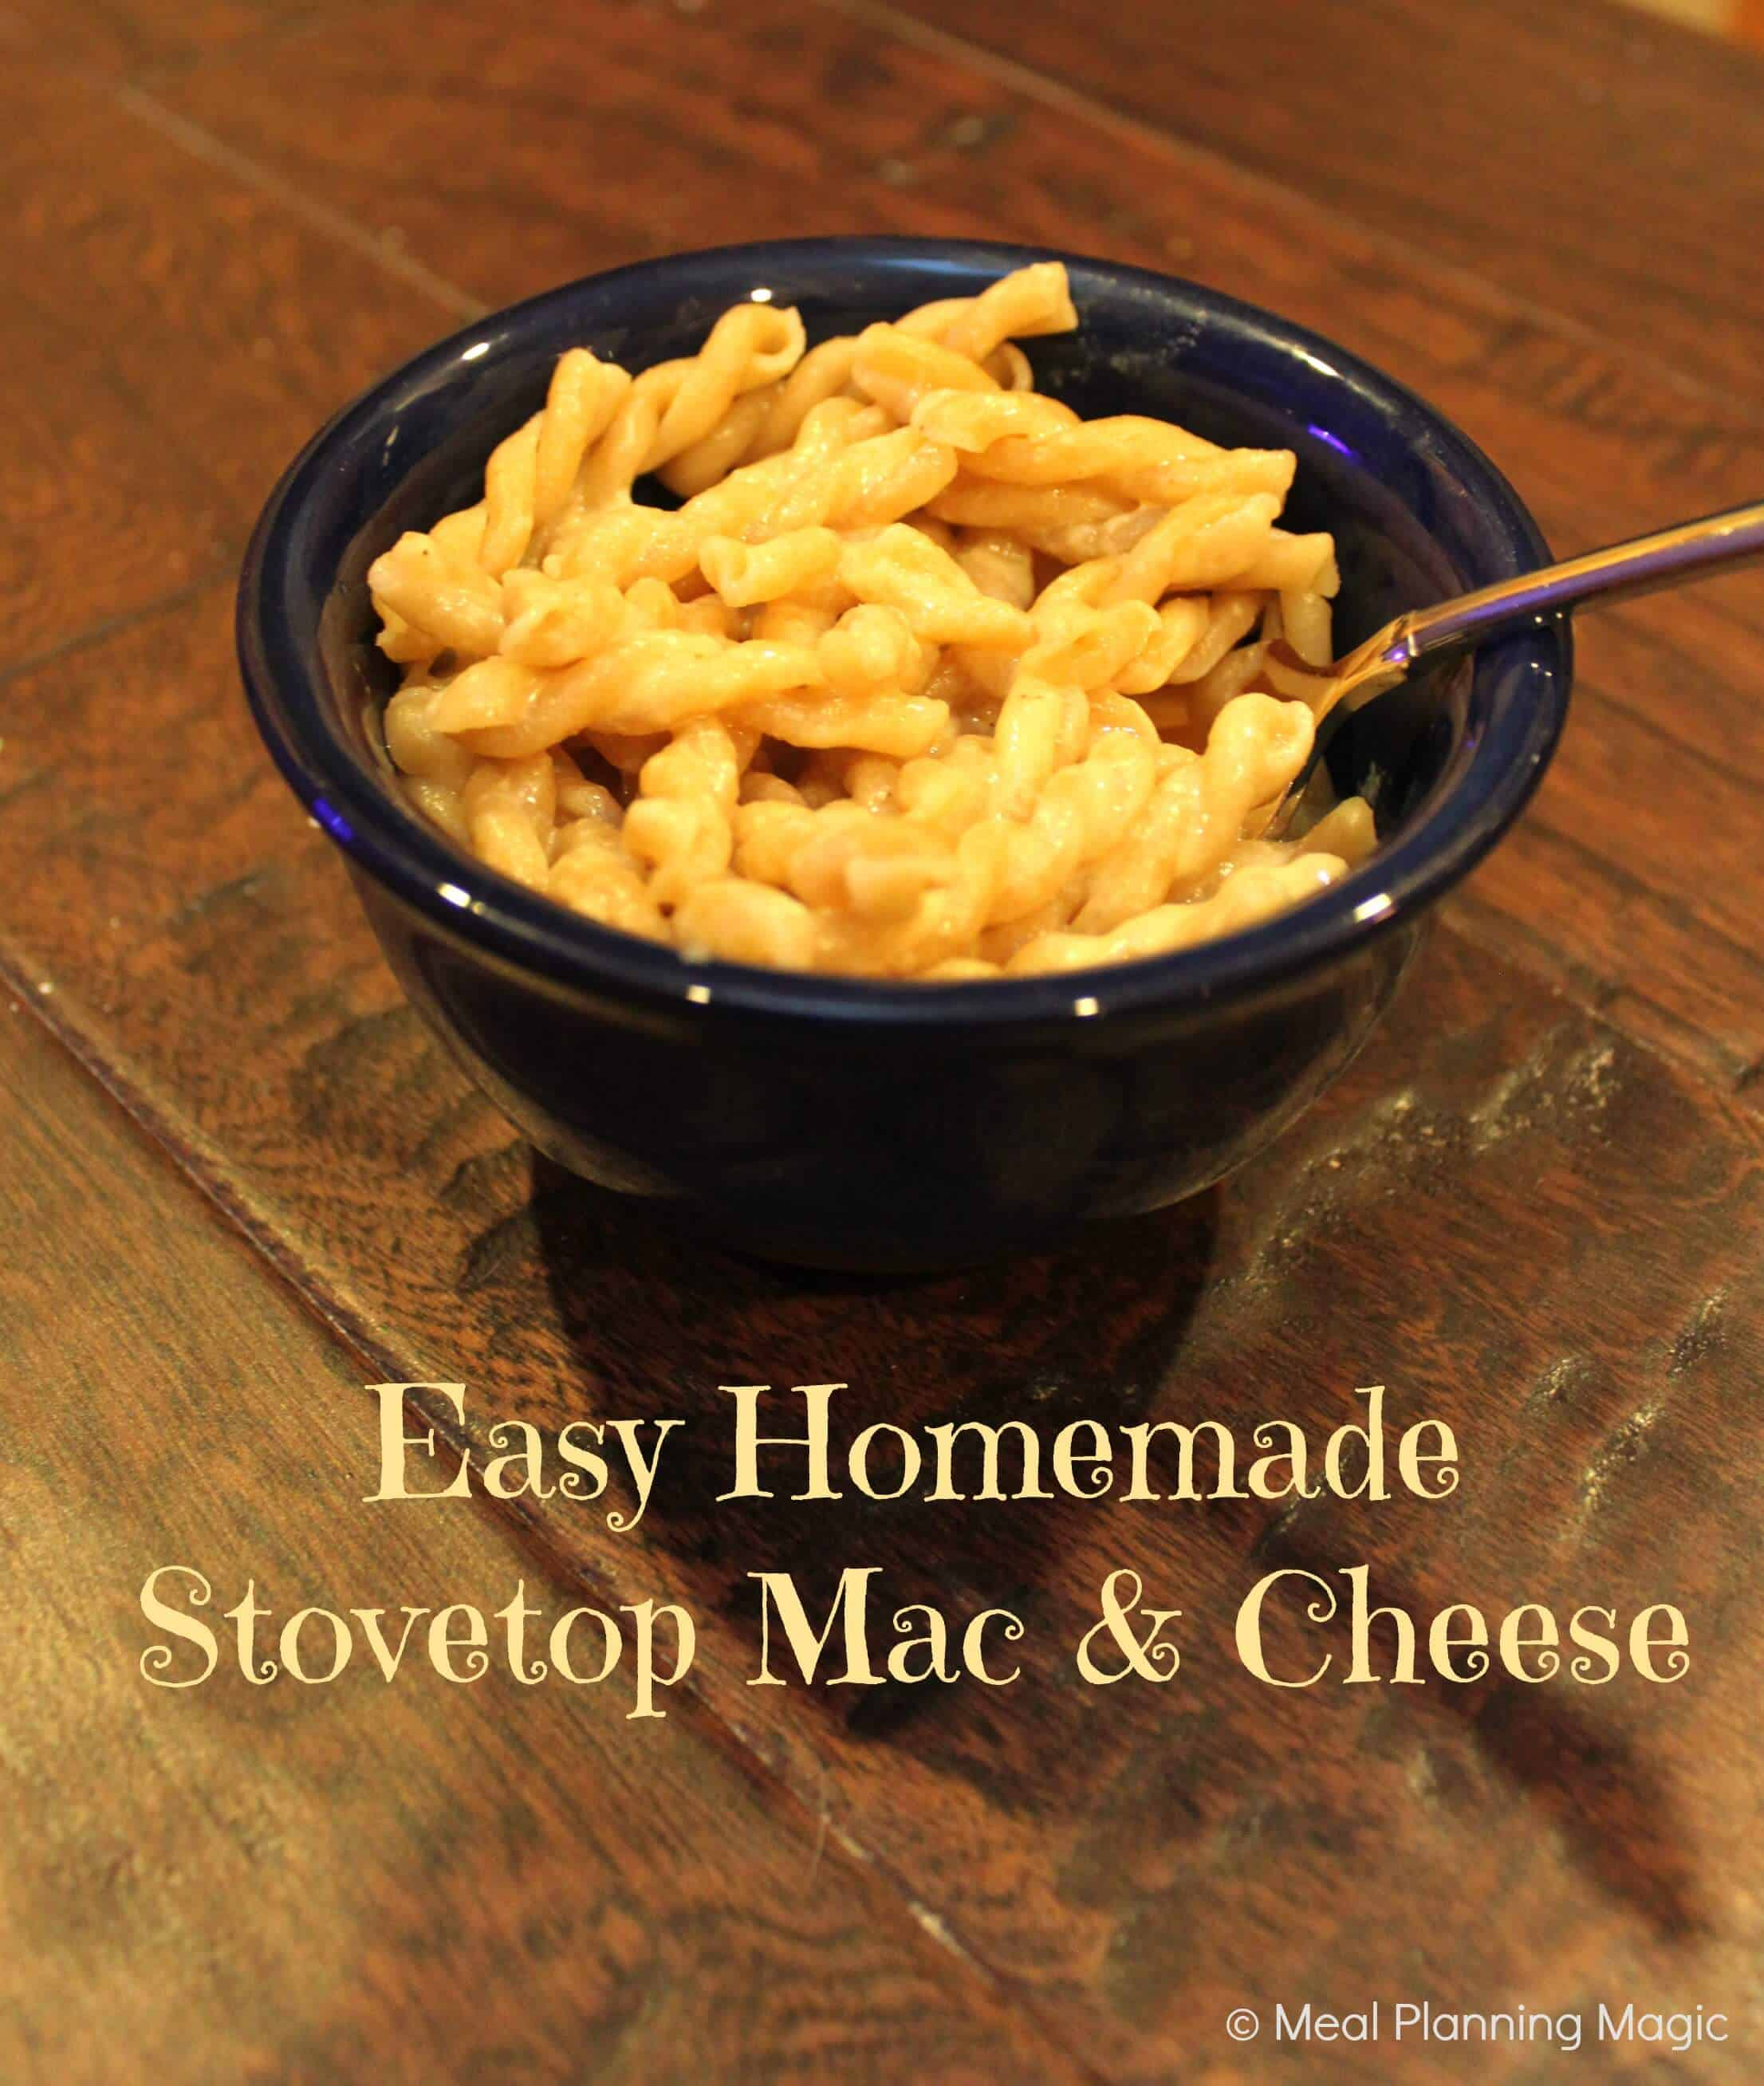 Easy Homemade Stovetop Mac & Cheese Recipe